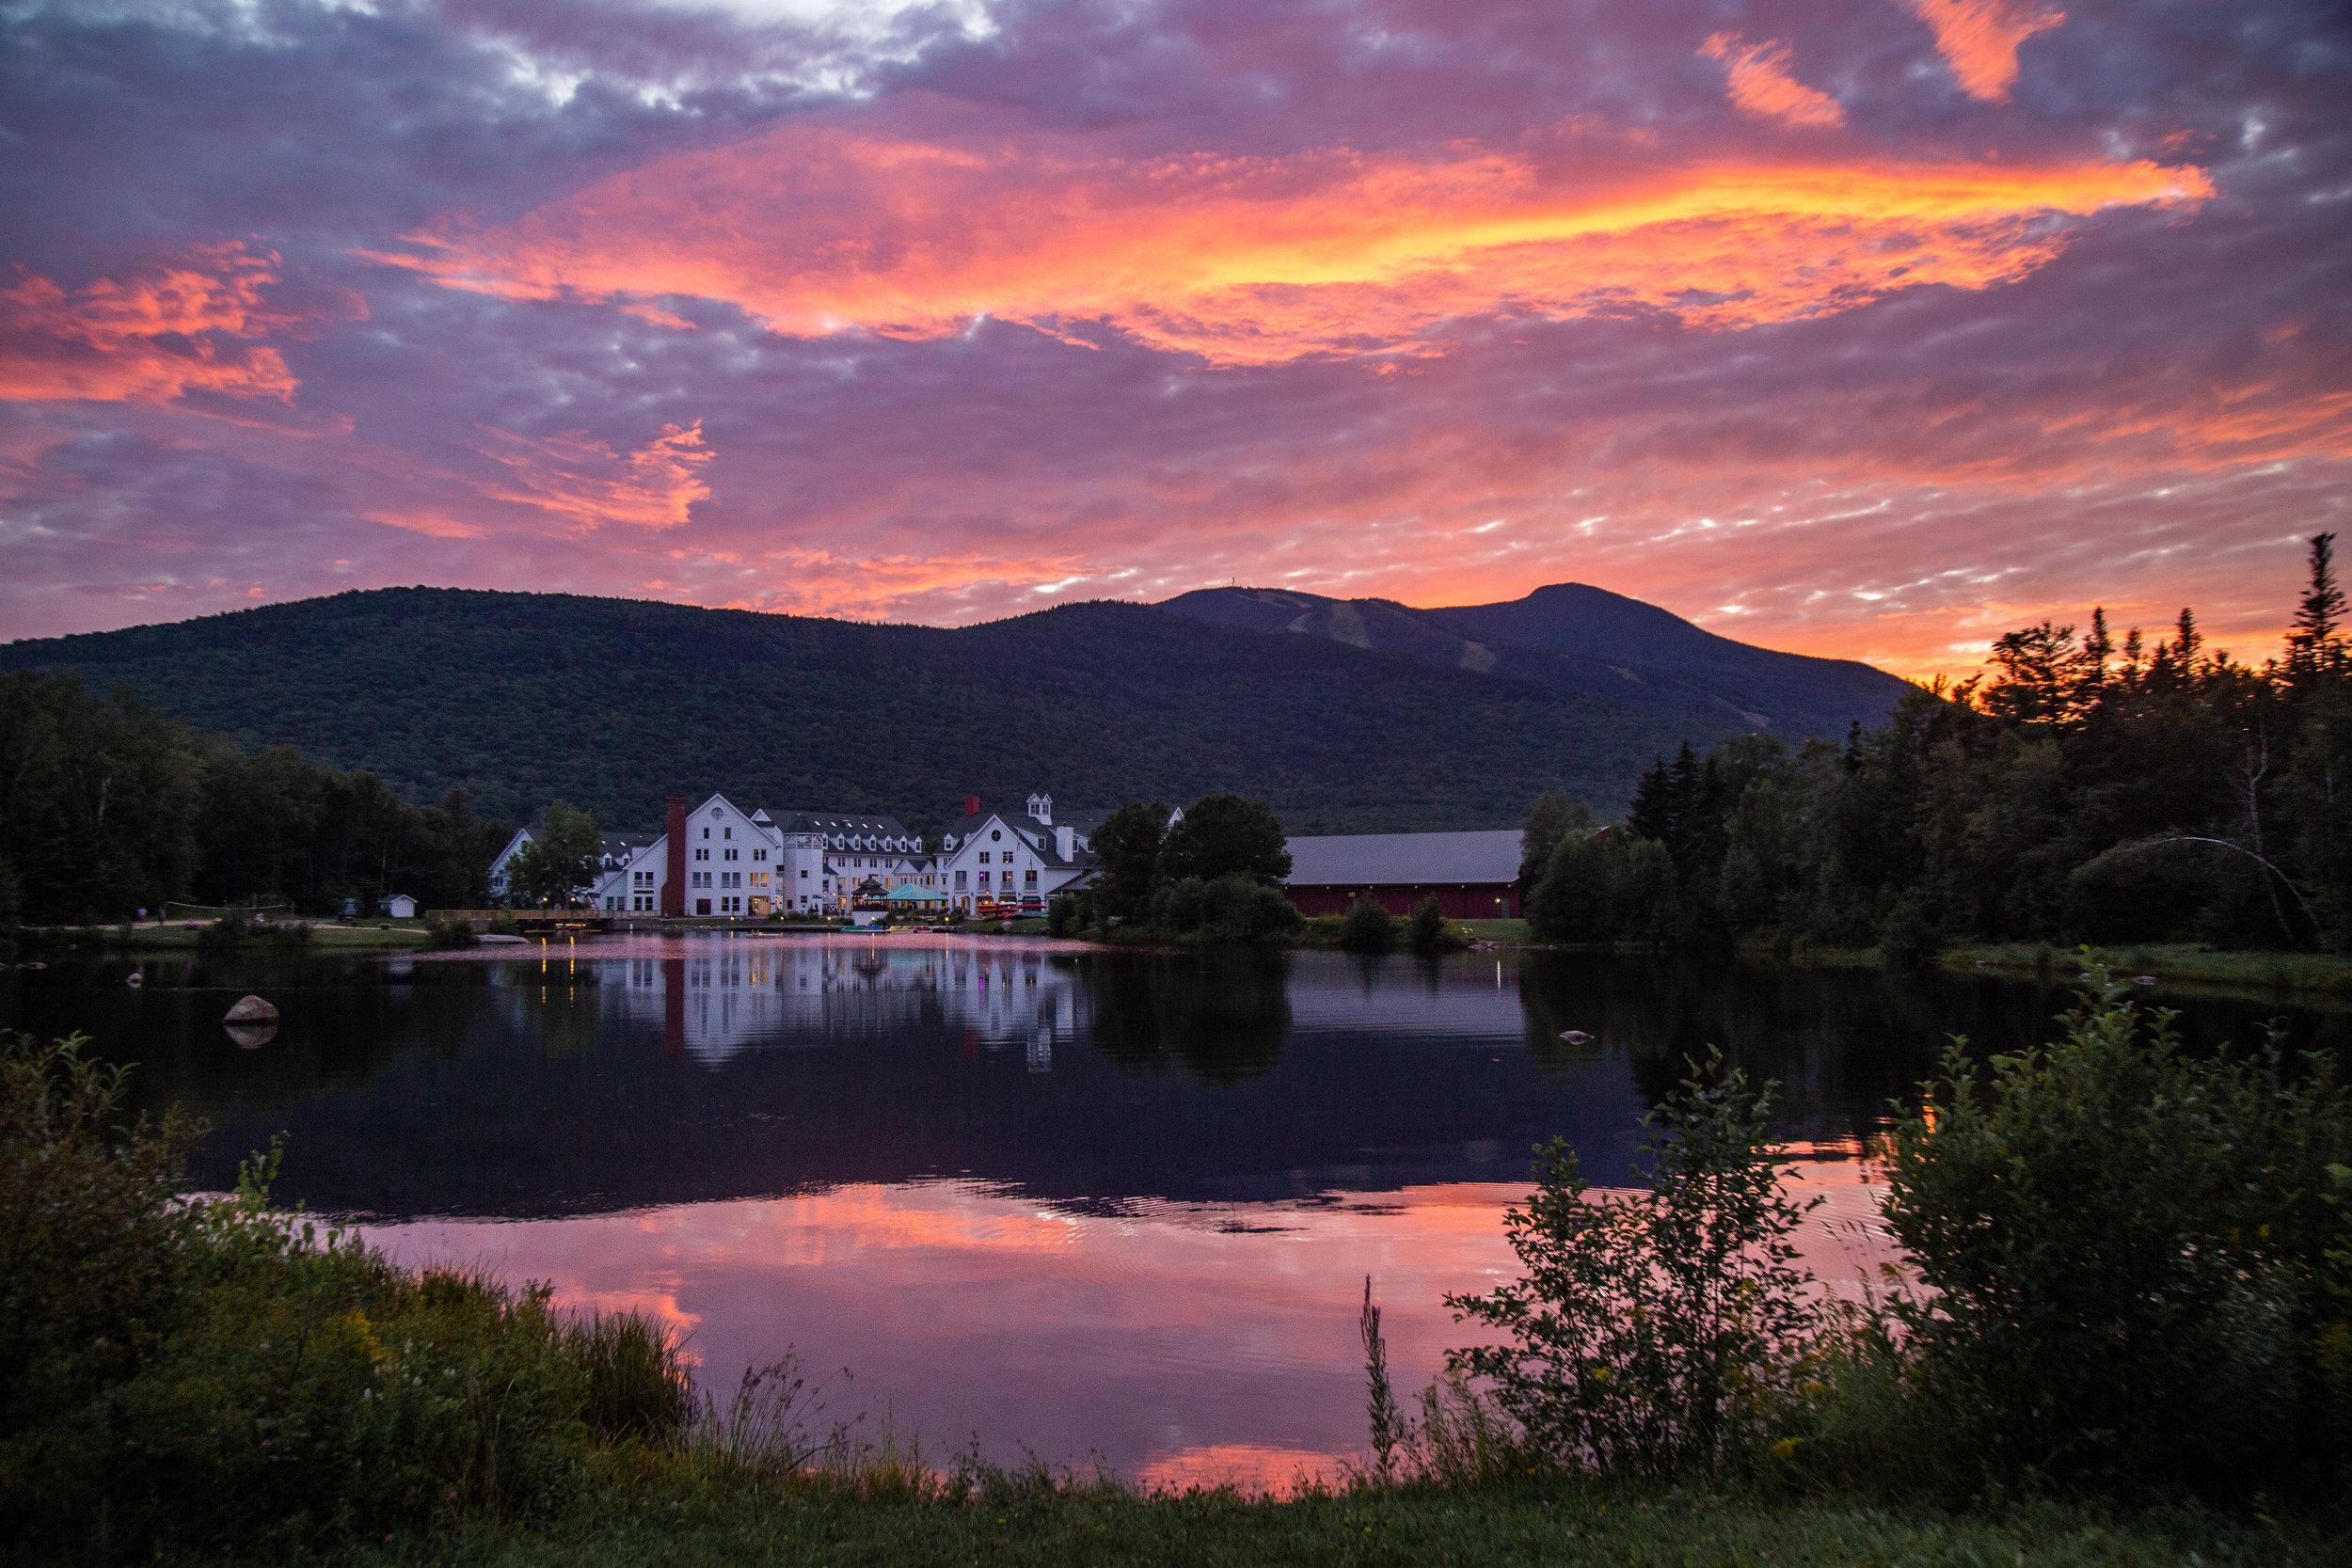 A beautiful sunset over Corcoran Pond